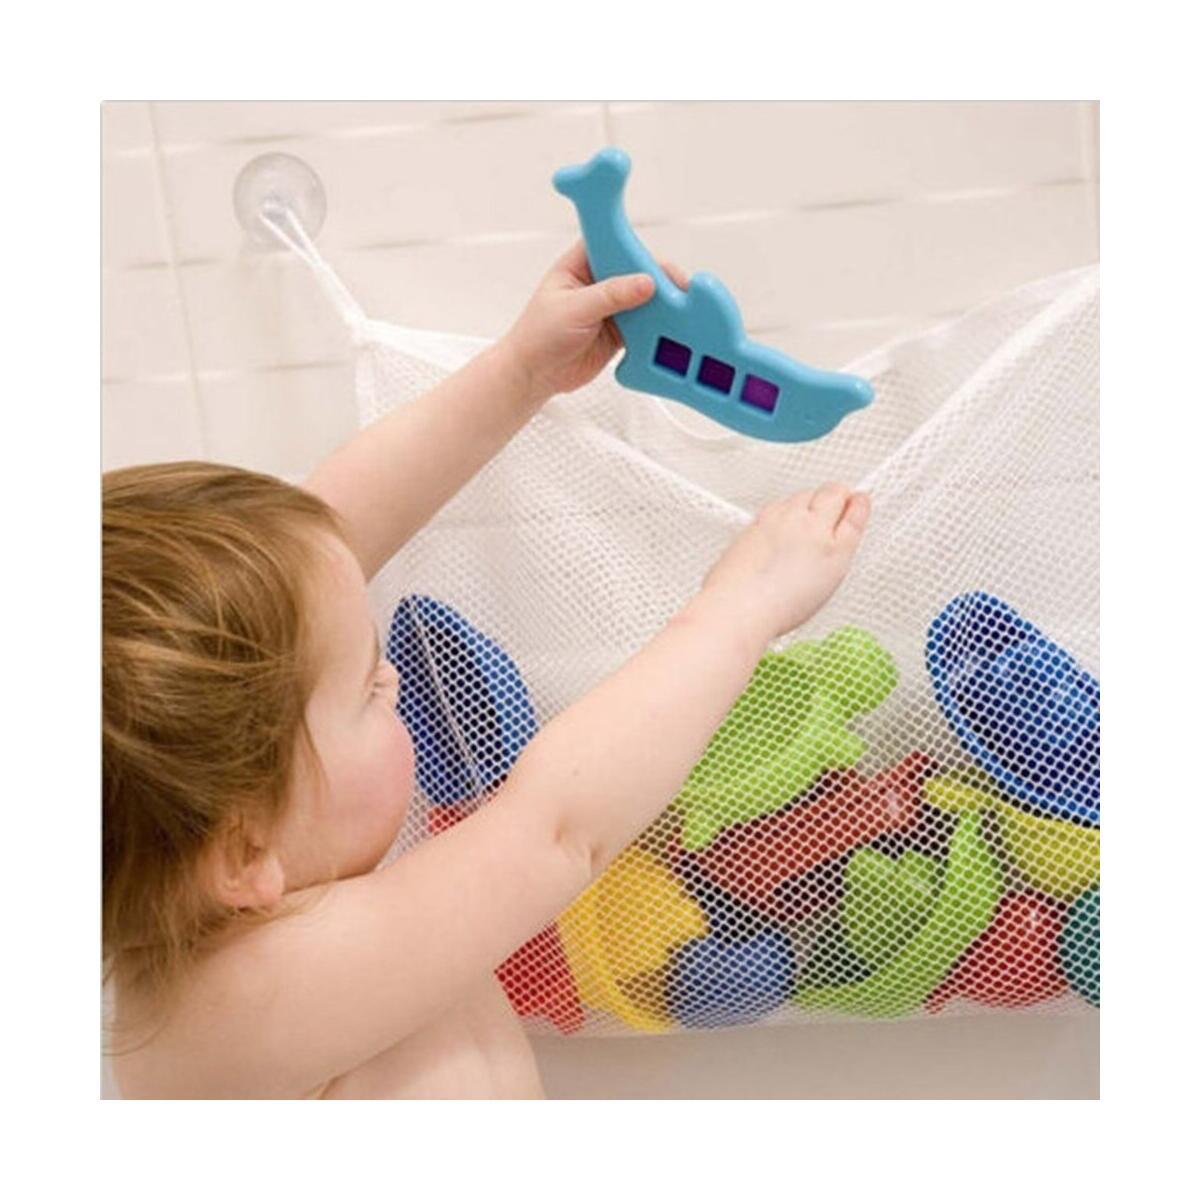 Baby bath time toys Tidy storage hanging bag mesh bag mesh bathroom Shower storage bag net